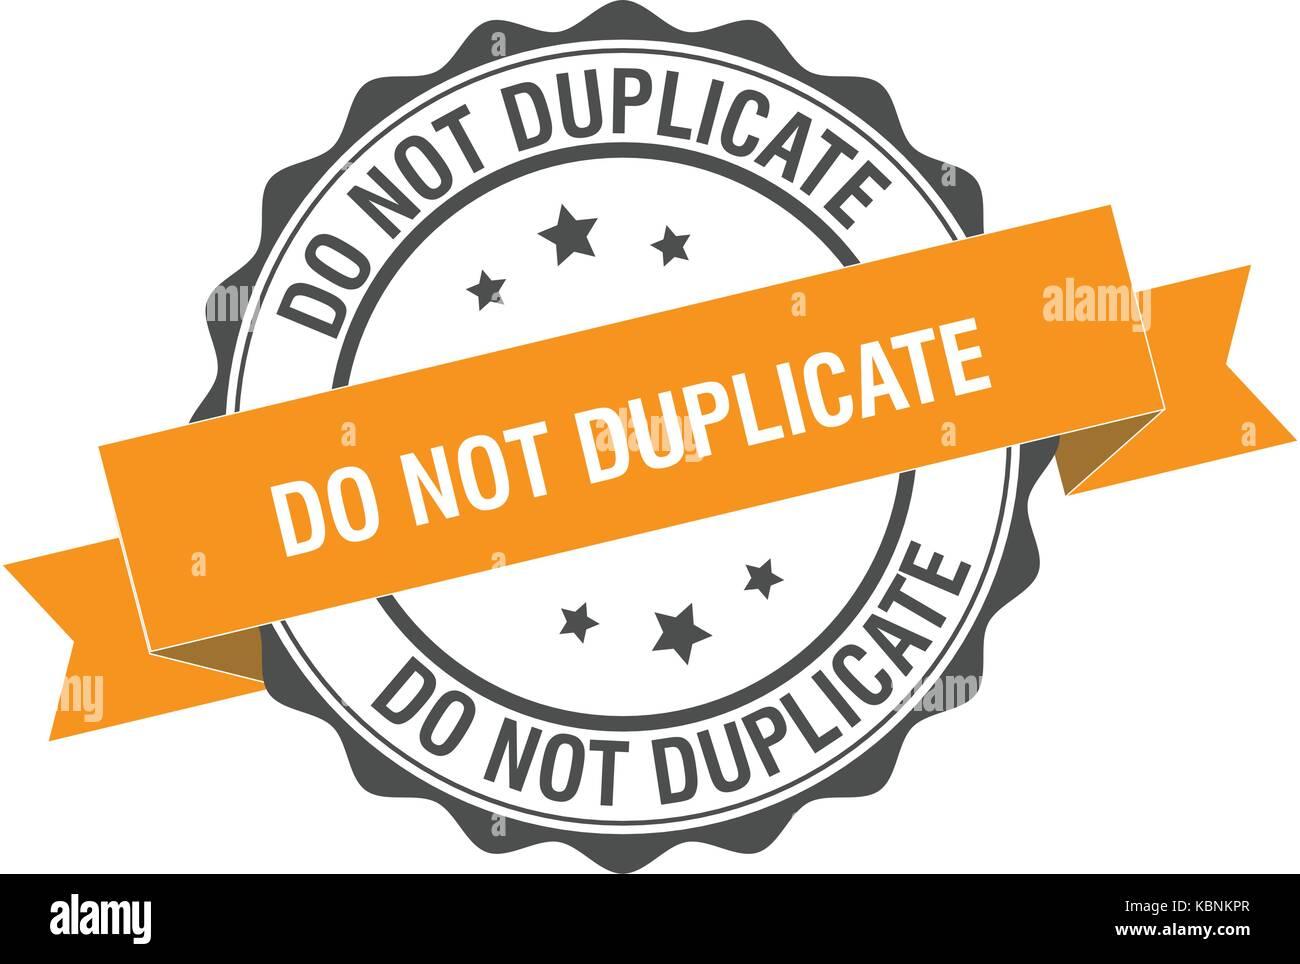 Do not duplicate stamp illustration - Stock Image